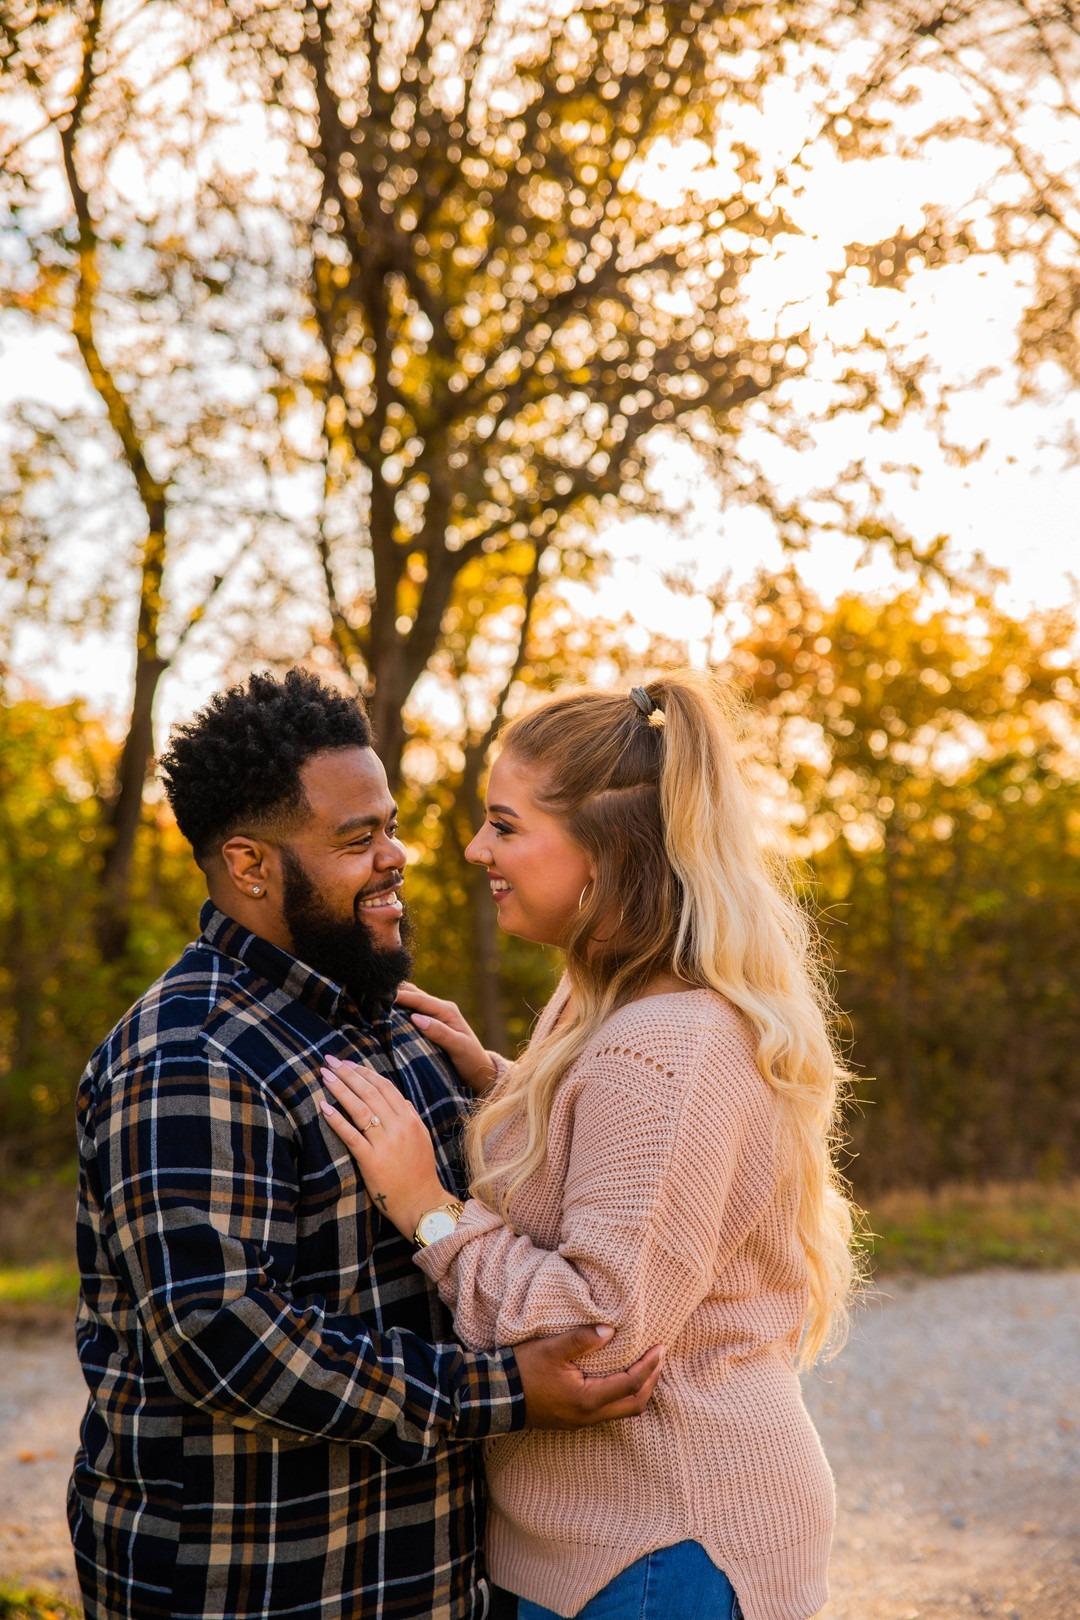 aldersgab dating love